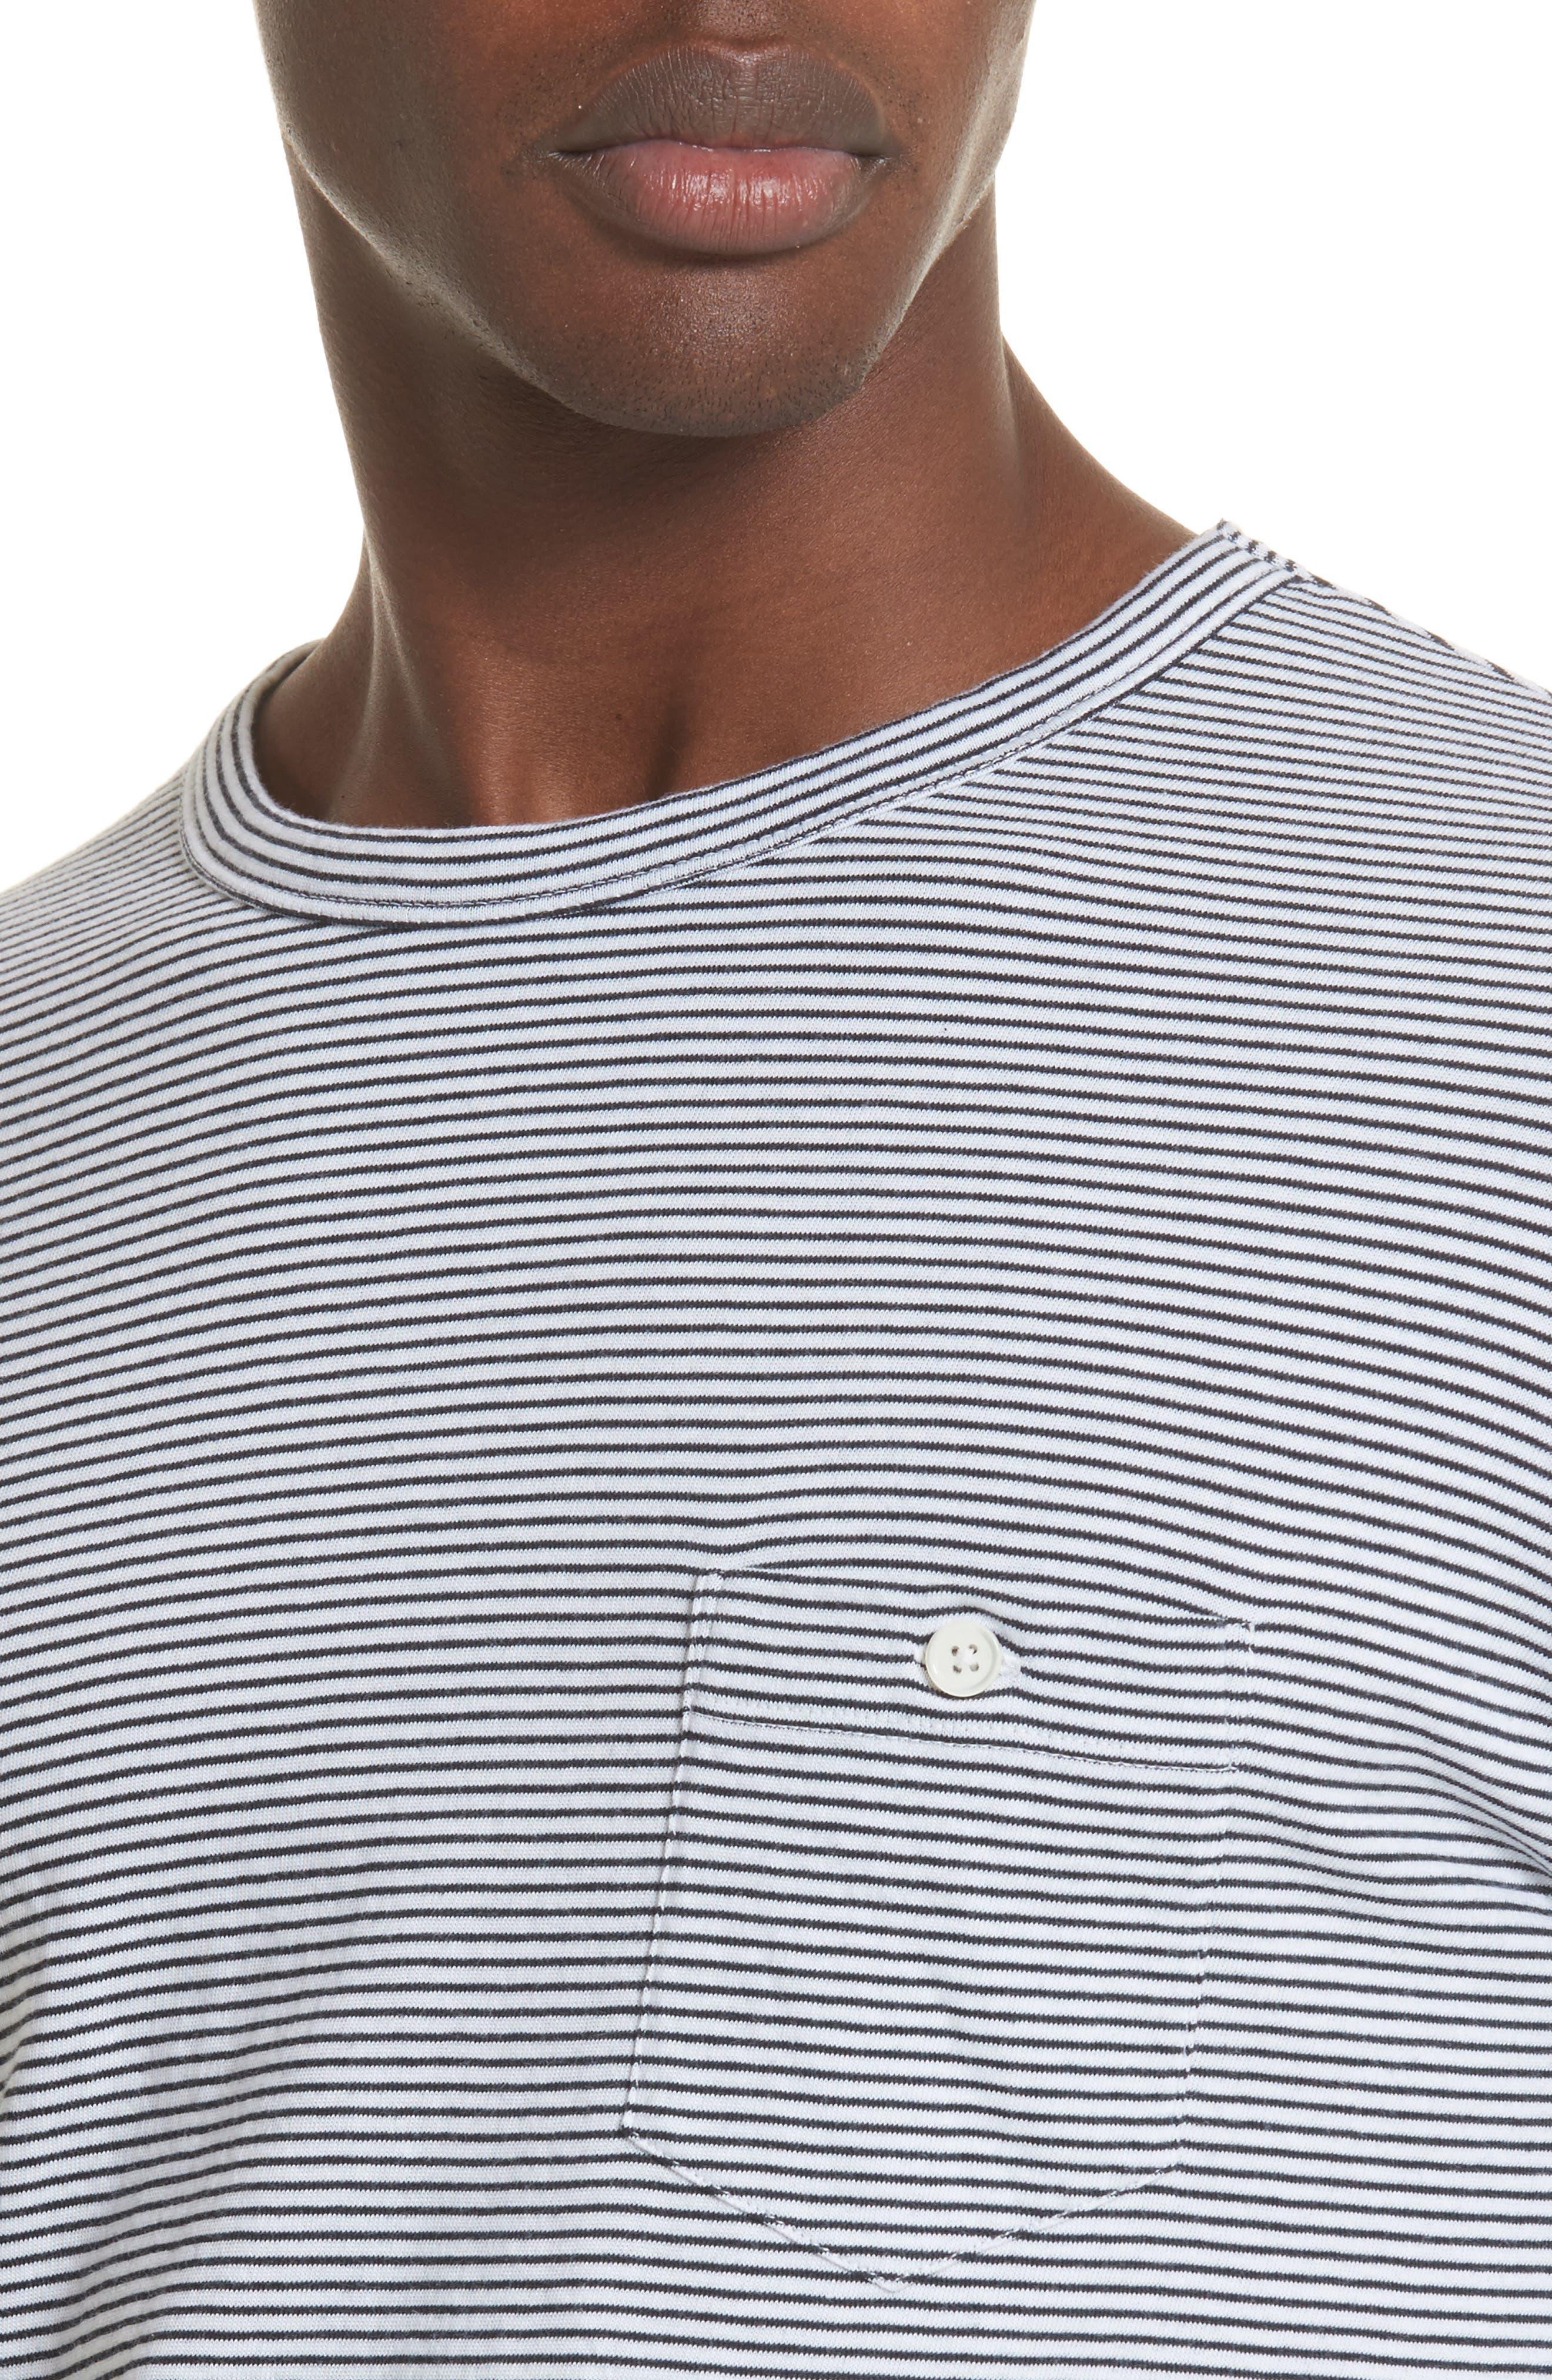 Todd Snyder Stripe Long Sleeve T-Shirt,                             Alternate thumbnail 4, color,                             Navy